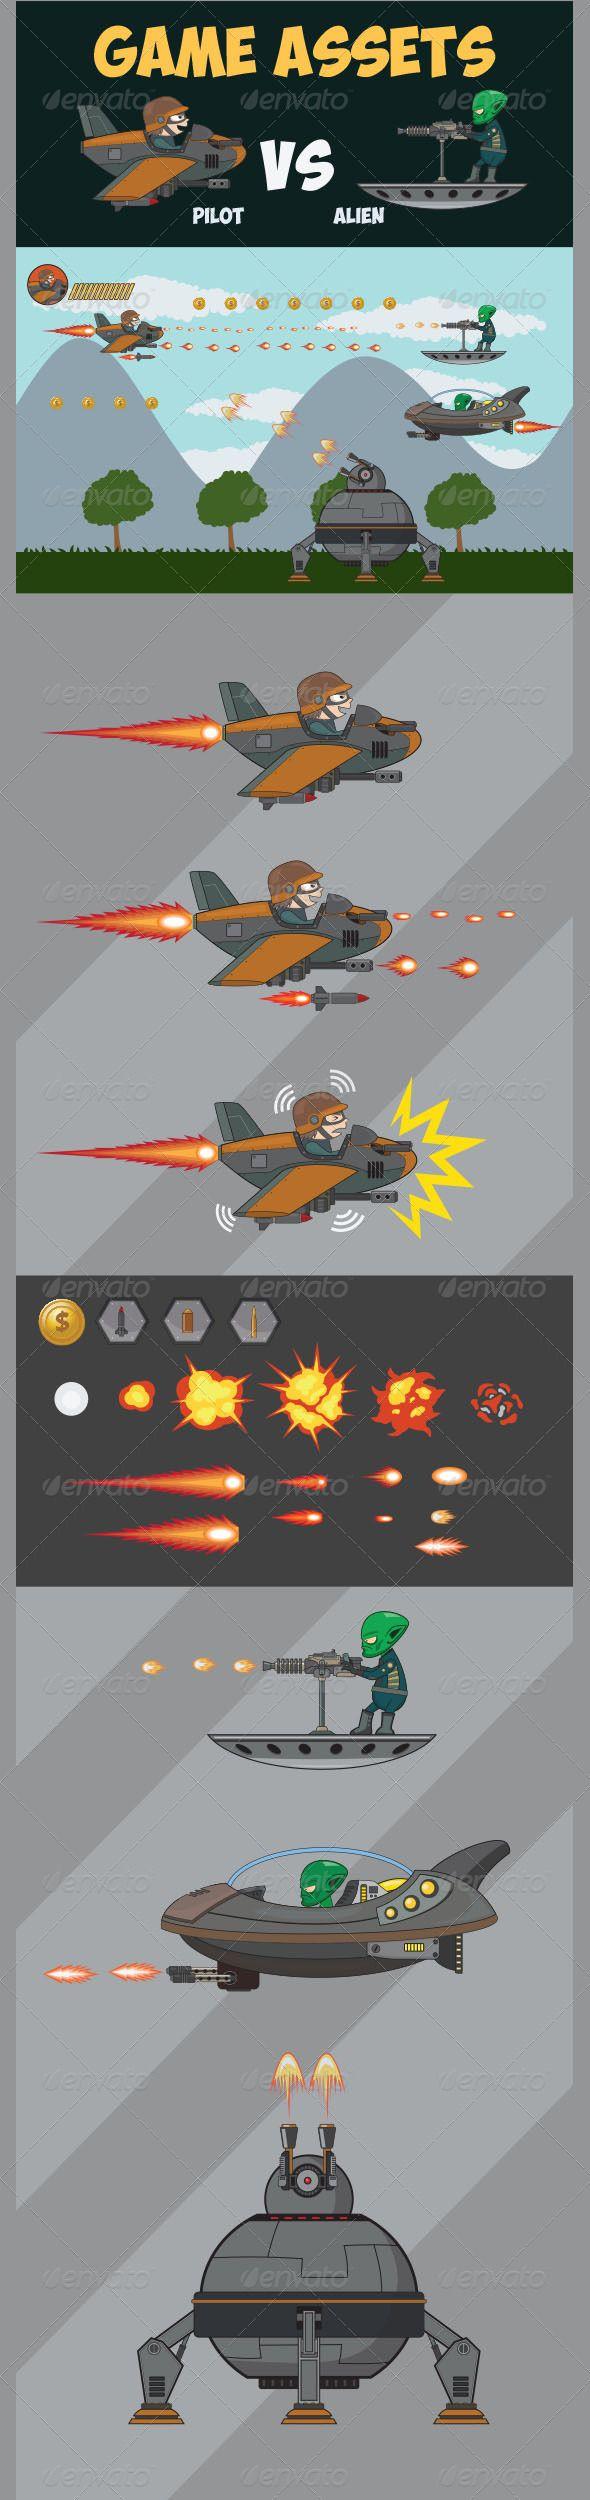 Game Asset  Pilot Vs Alien — Vector EPS #cartoon #item • Available here → https://graphicriver.net/item/game-asset-pilot-vs-alien/7975387?ref=pxcr